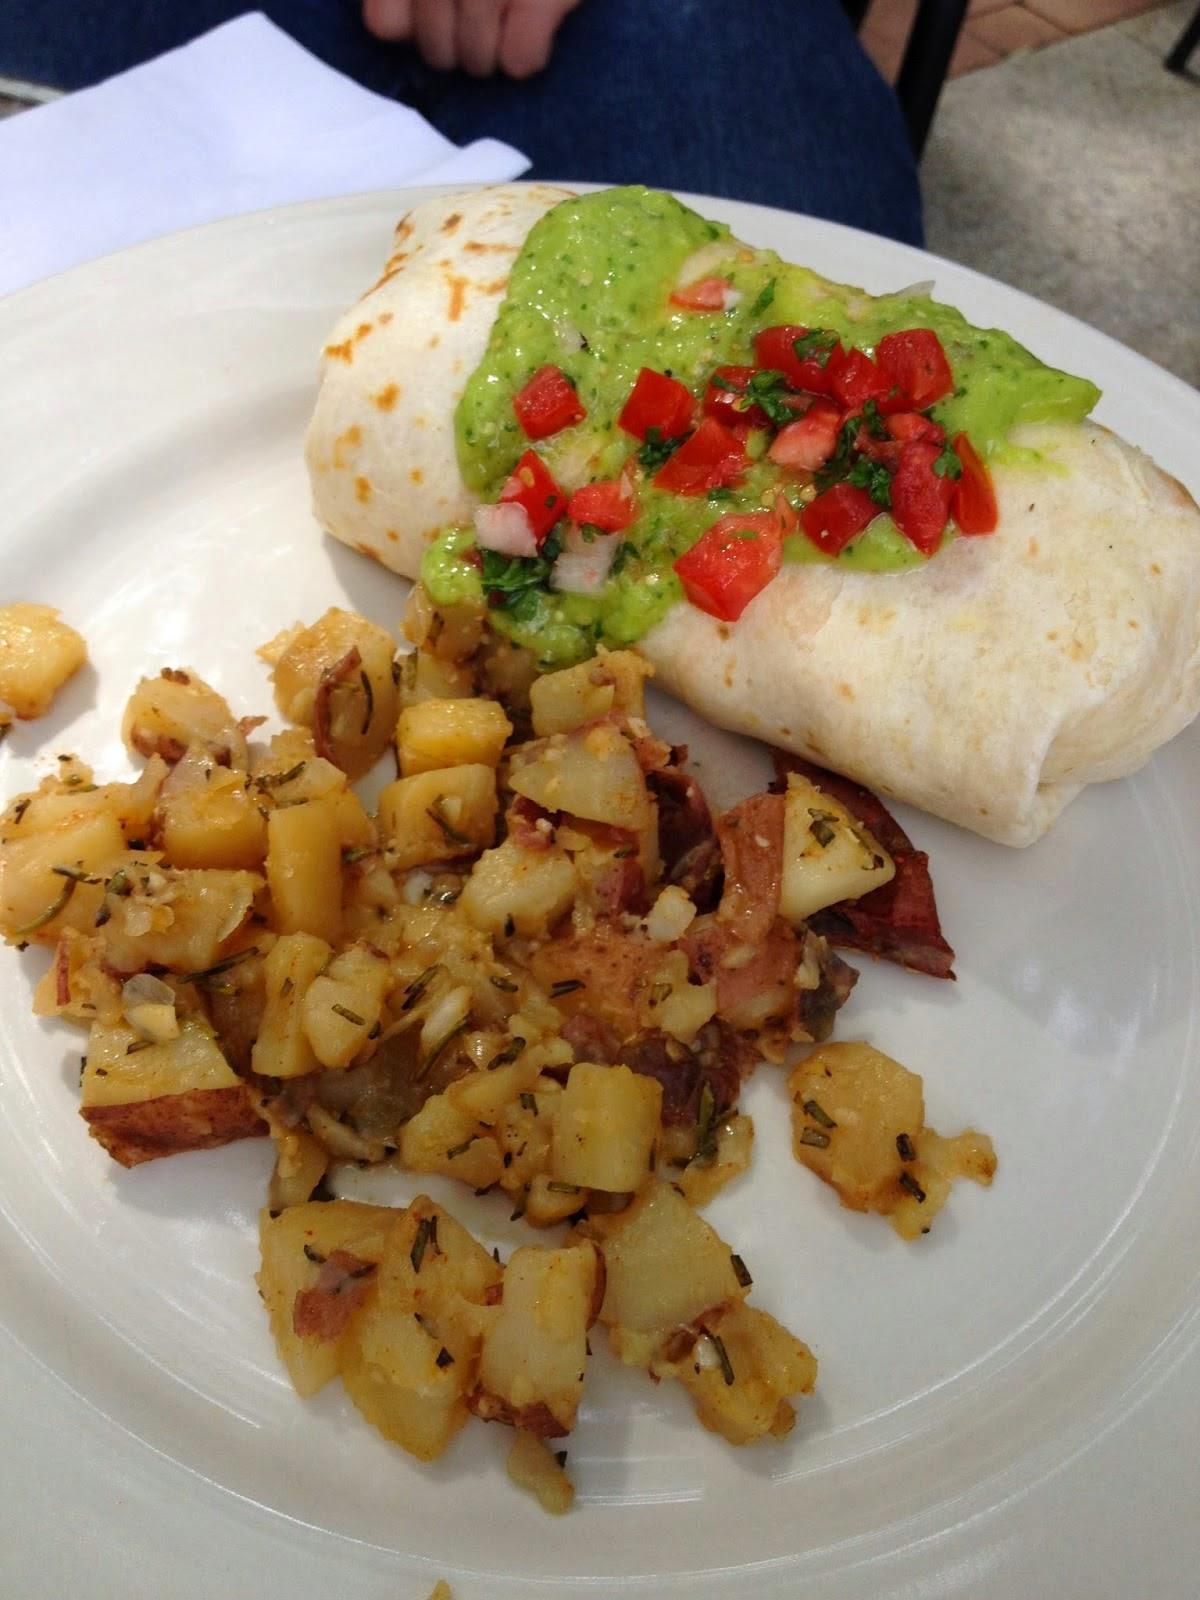 Cafe Cubano, Farmer's Market, and UVA in Charlottesville, Virginia!